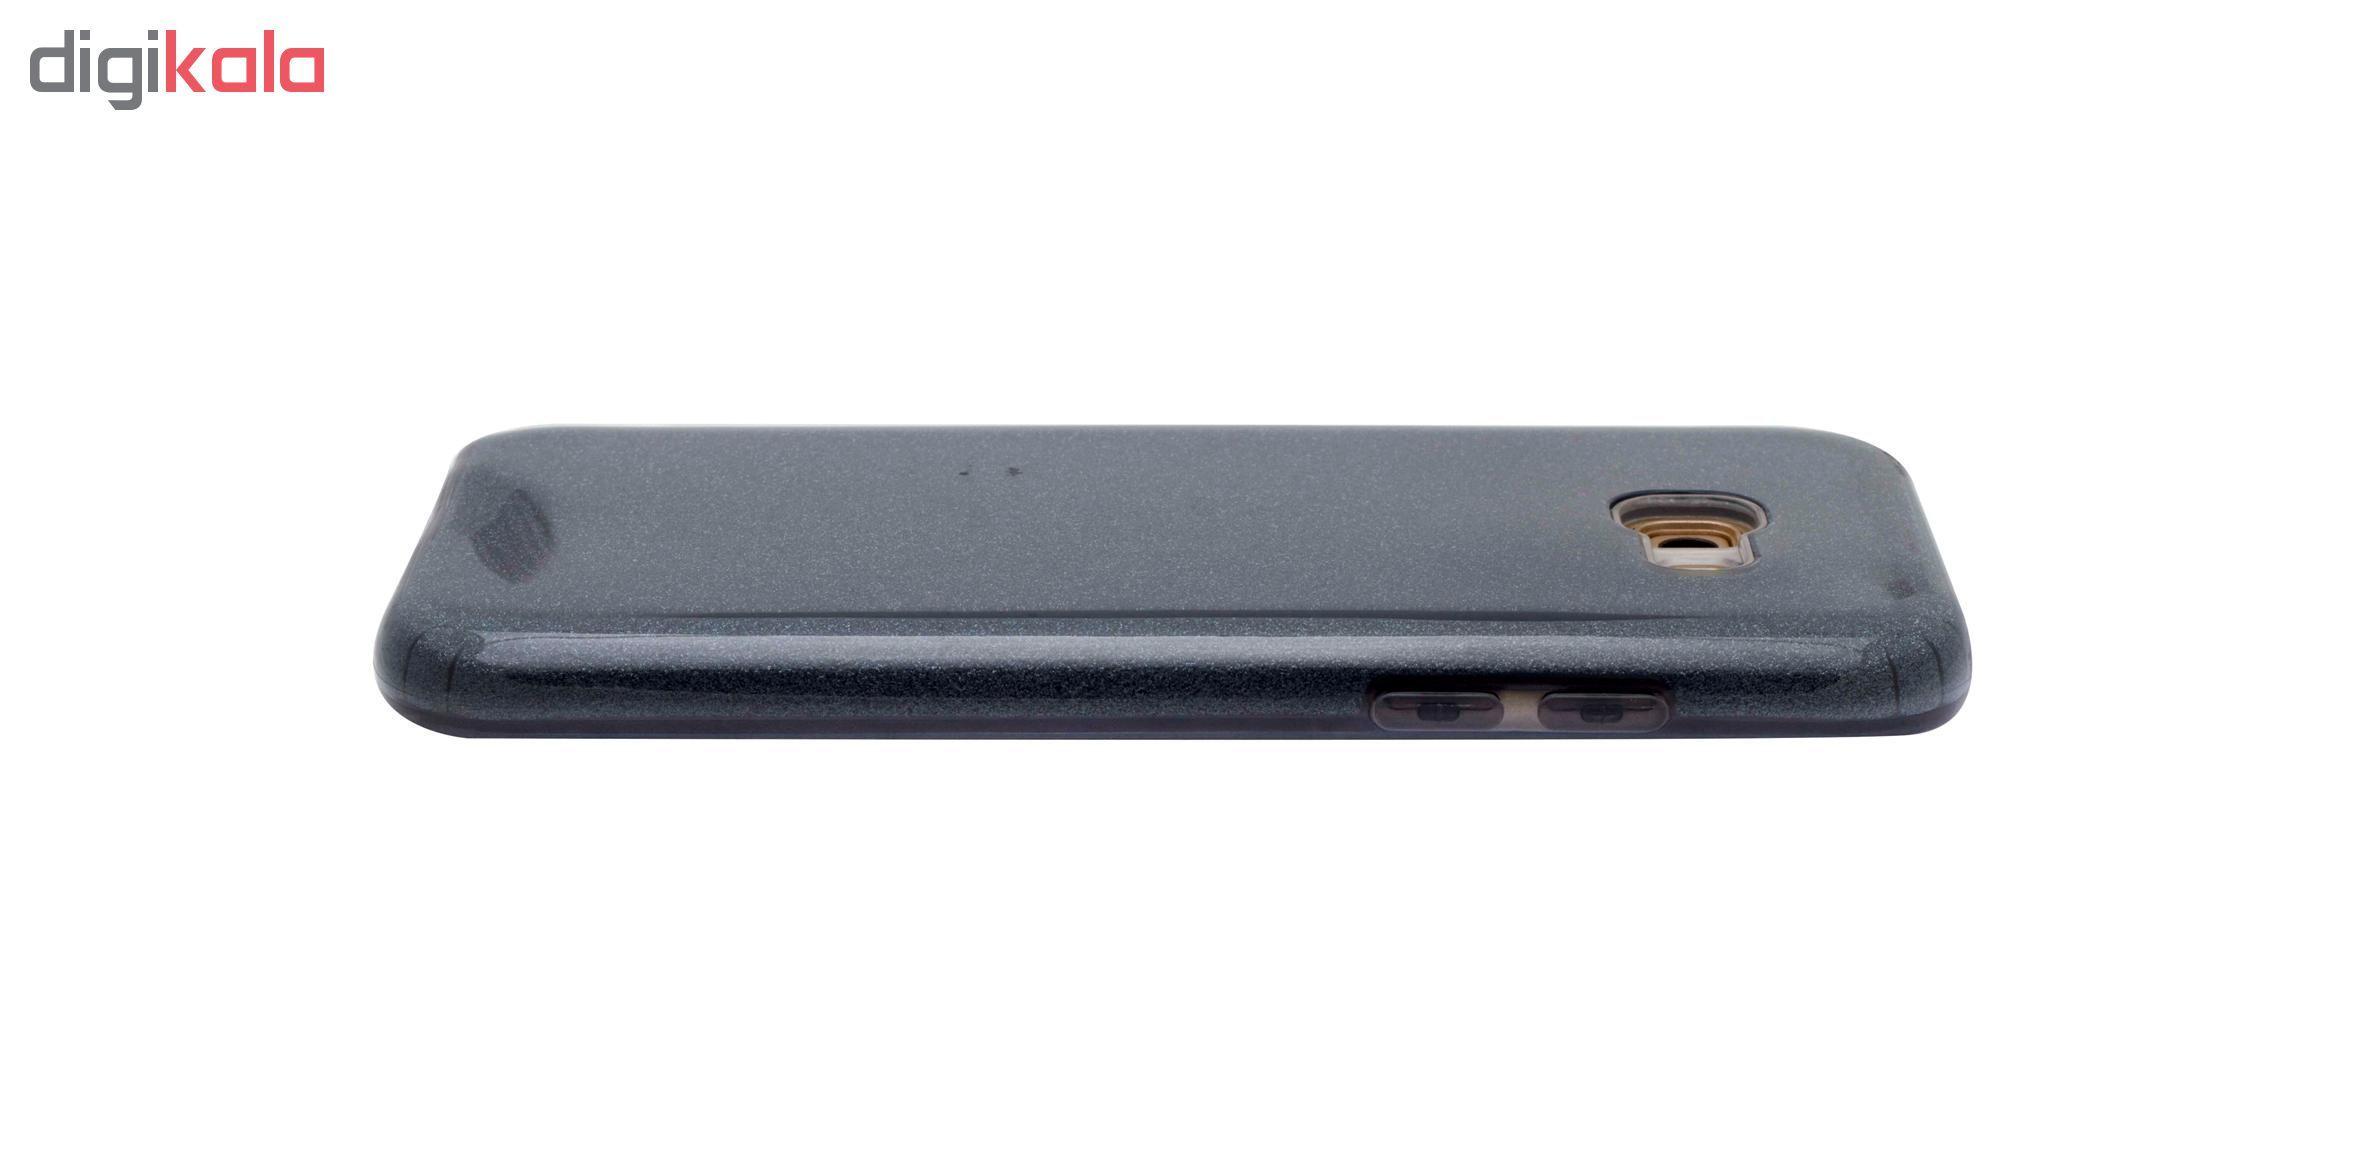 کاور مدل CORONA طرح اکلیلی مناسب برای گوشی سامسونگ گلکسی A5 2017 / A520 main 1 24